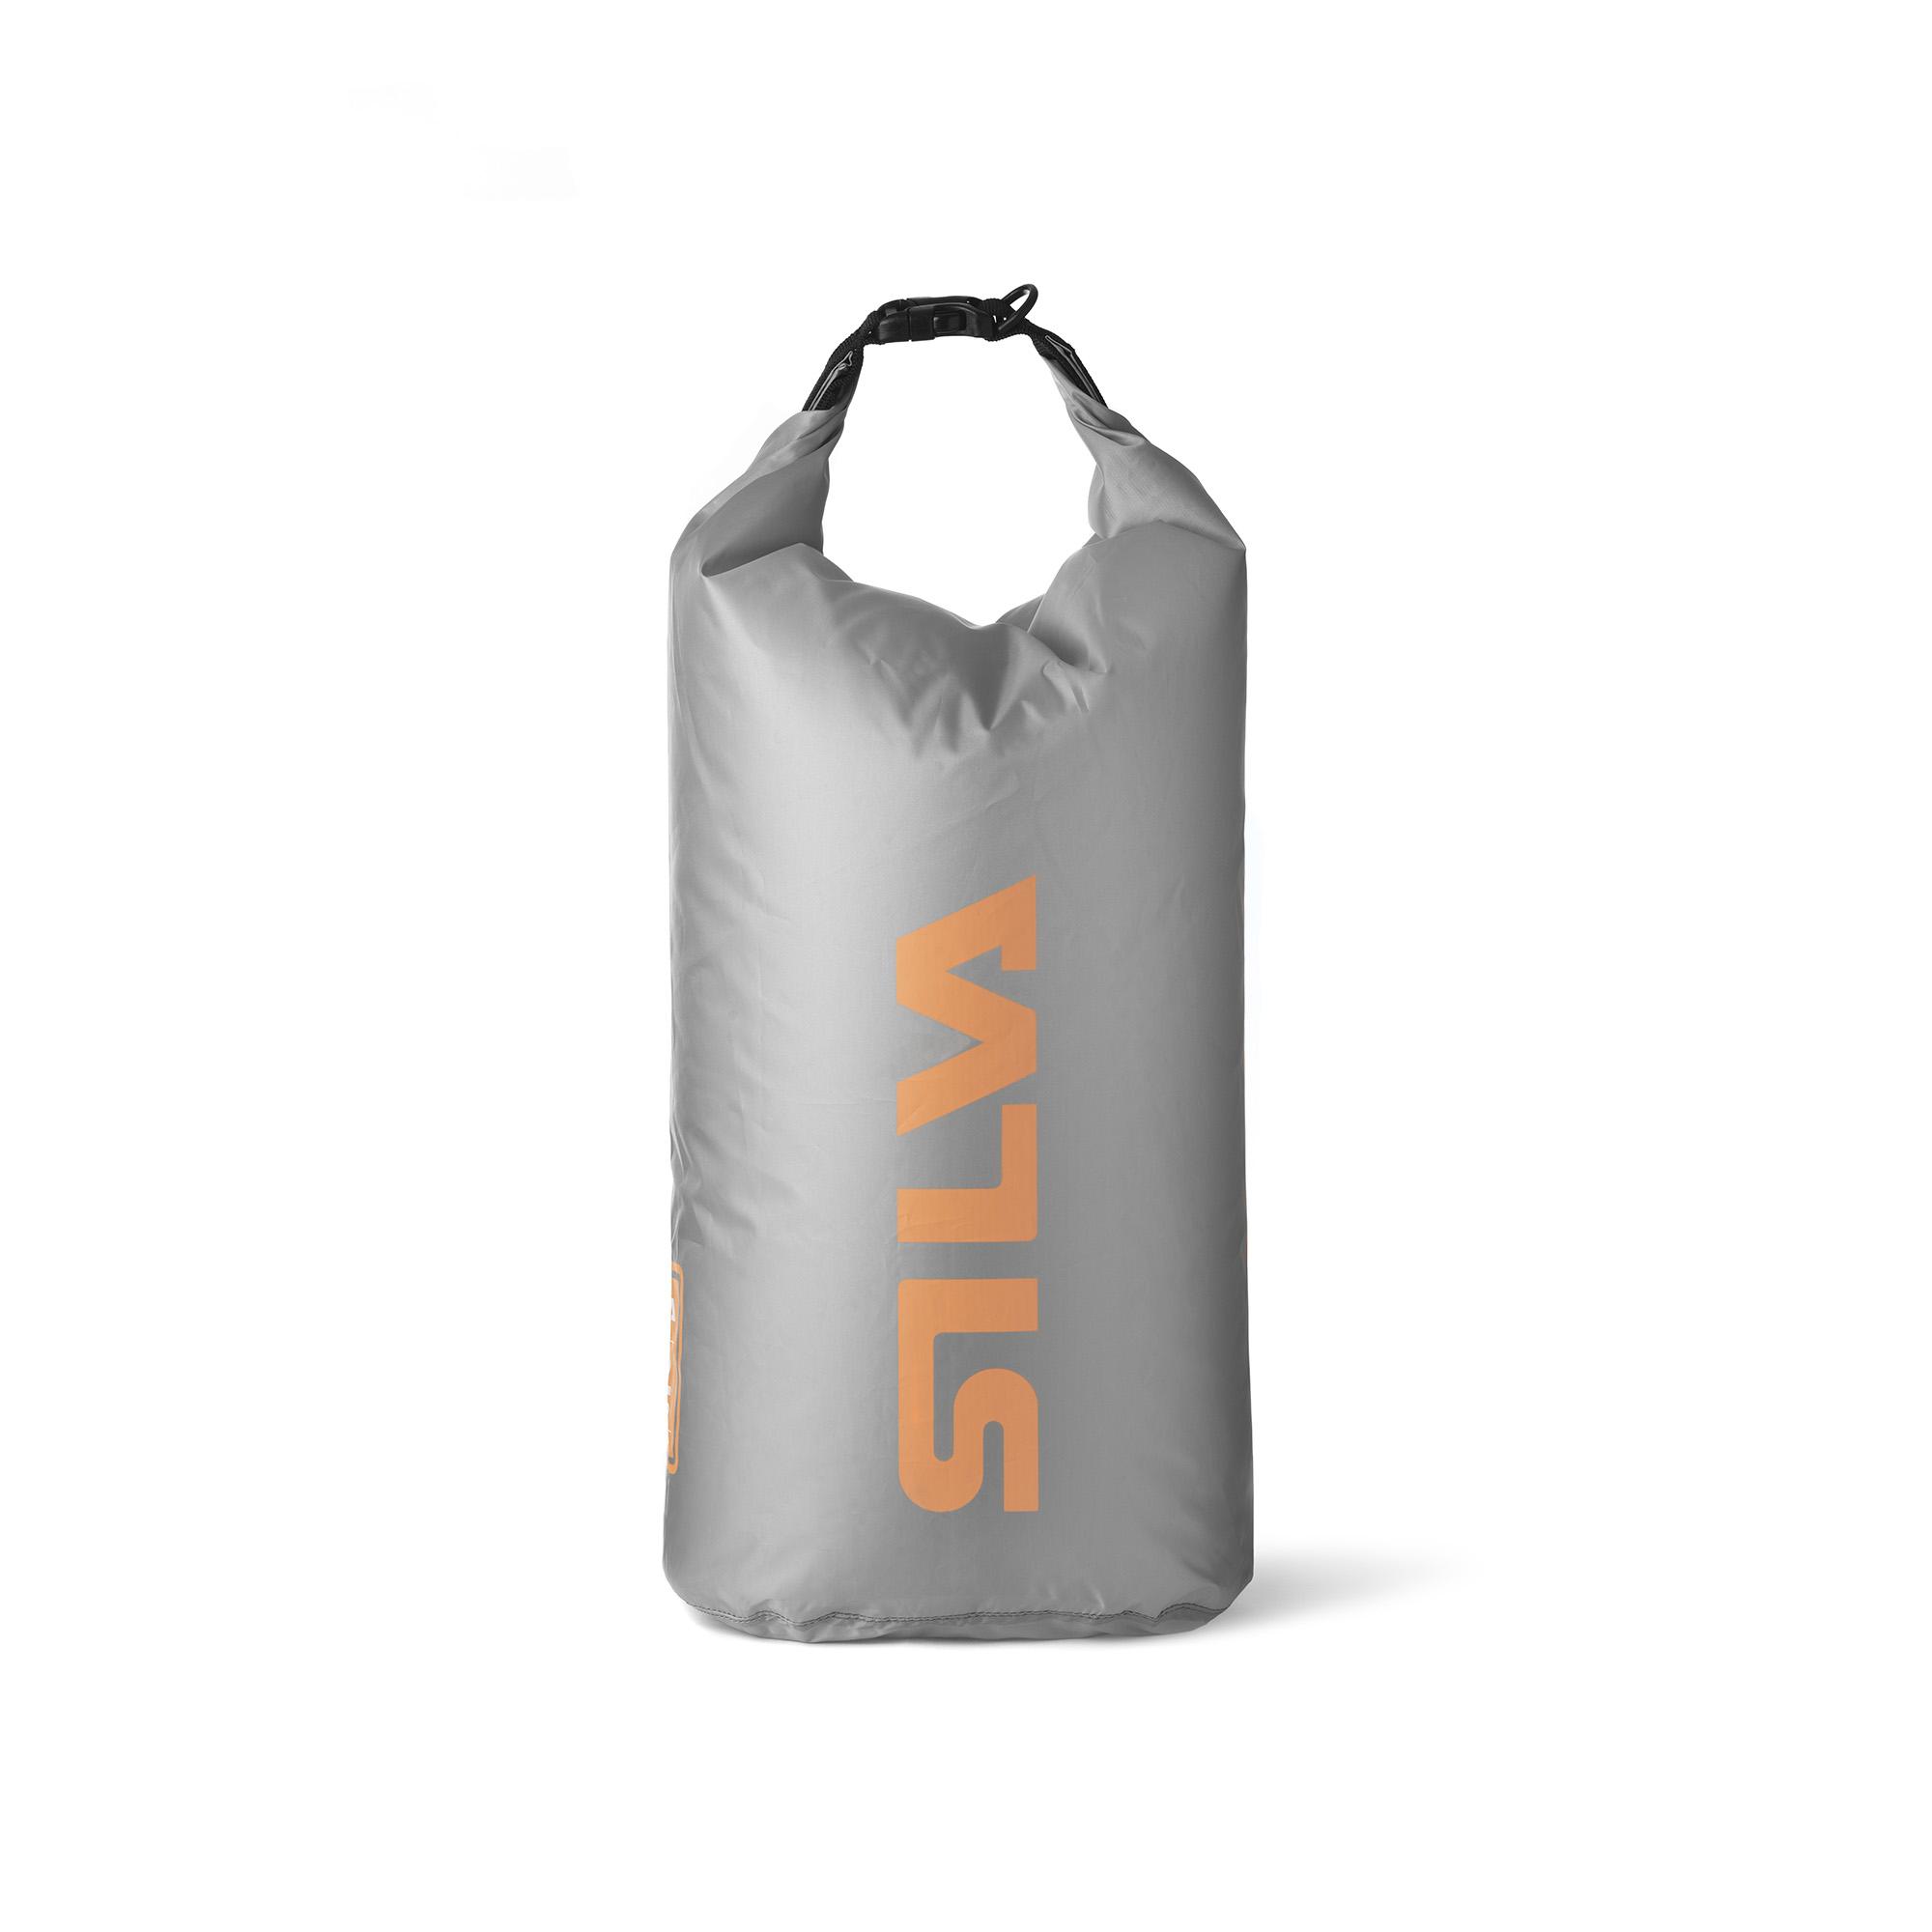 dry-bag-r-pet_100-recycled_12l